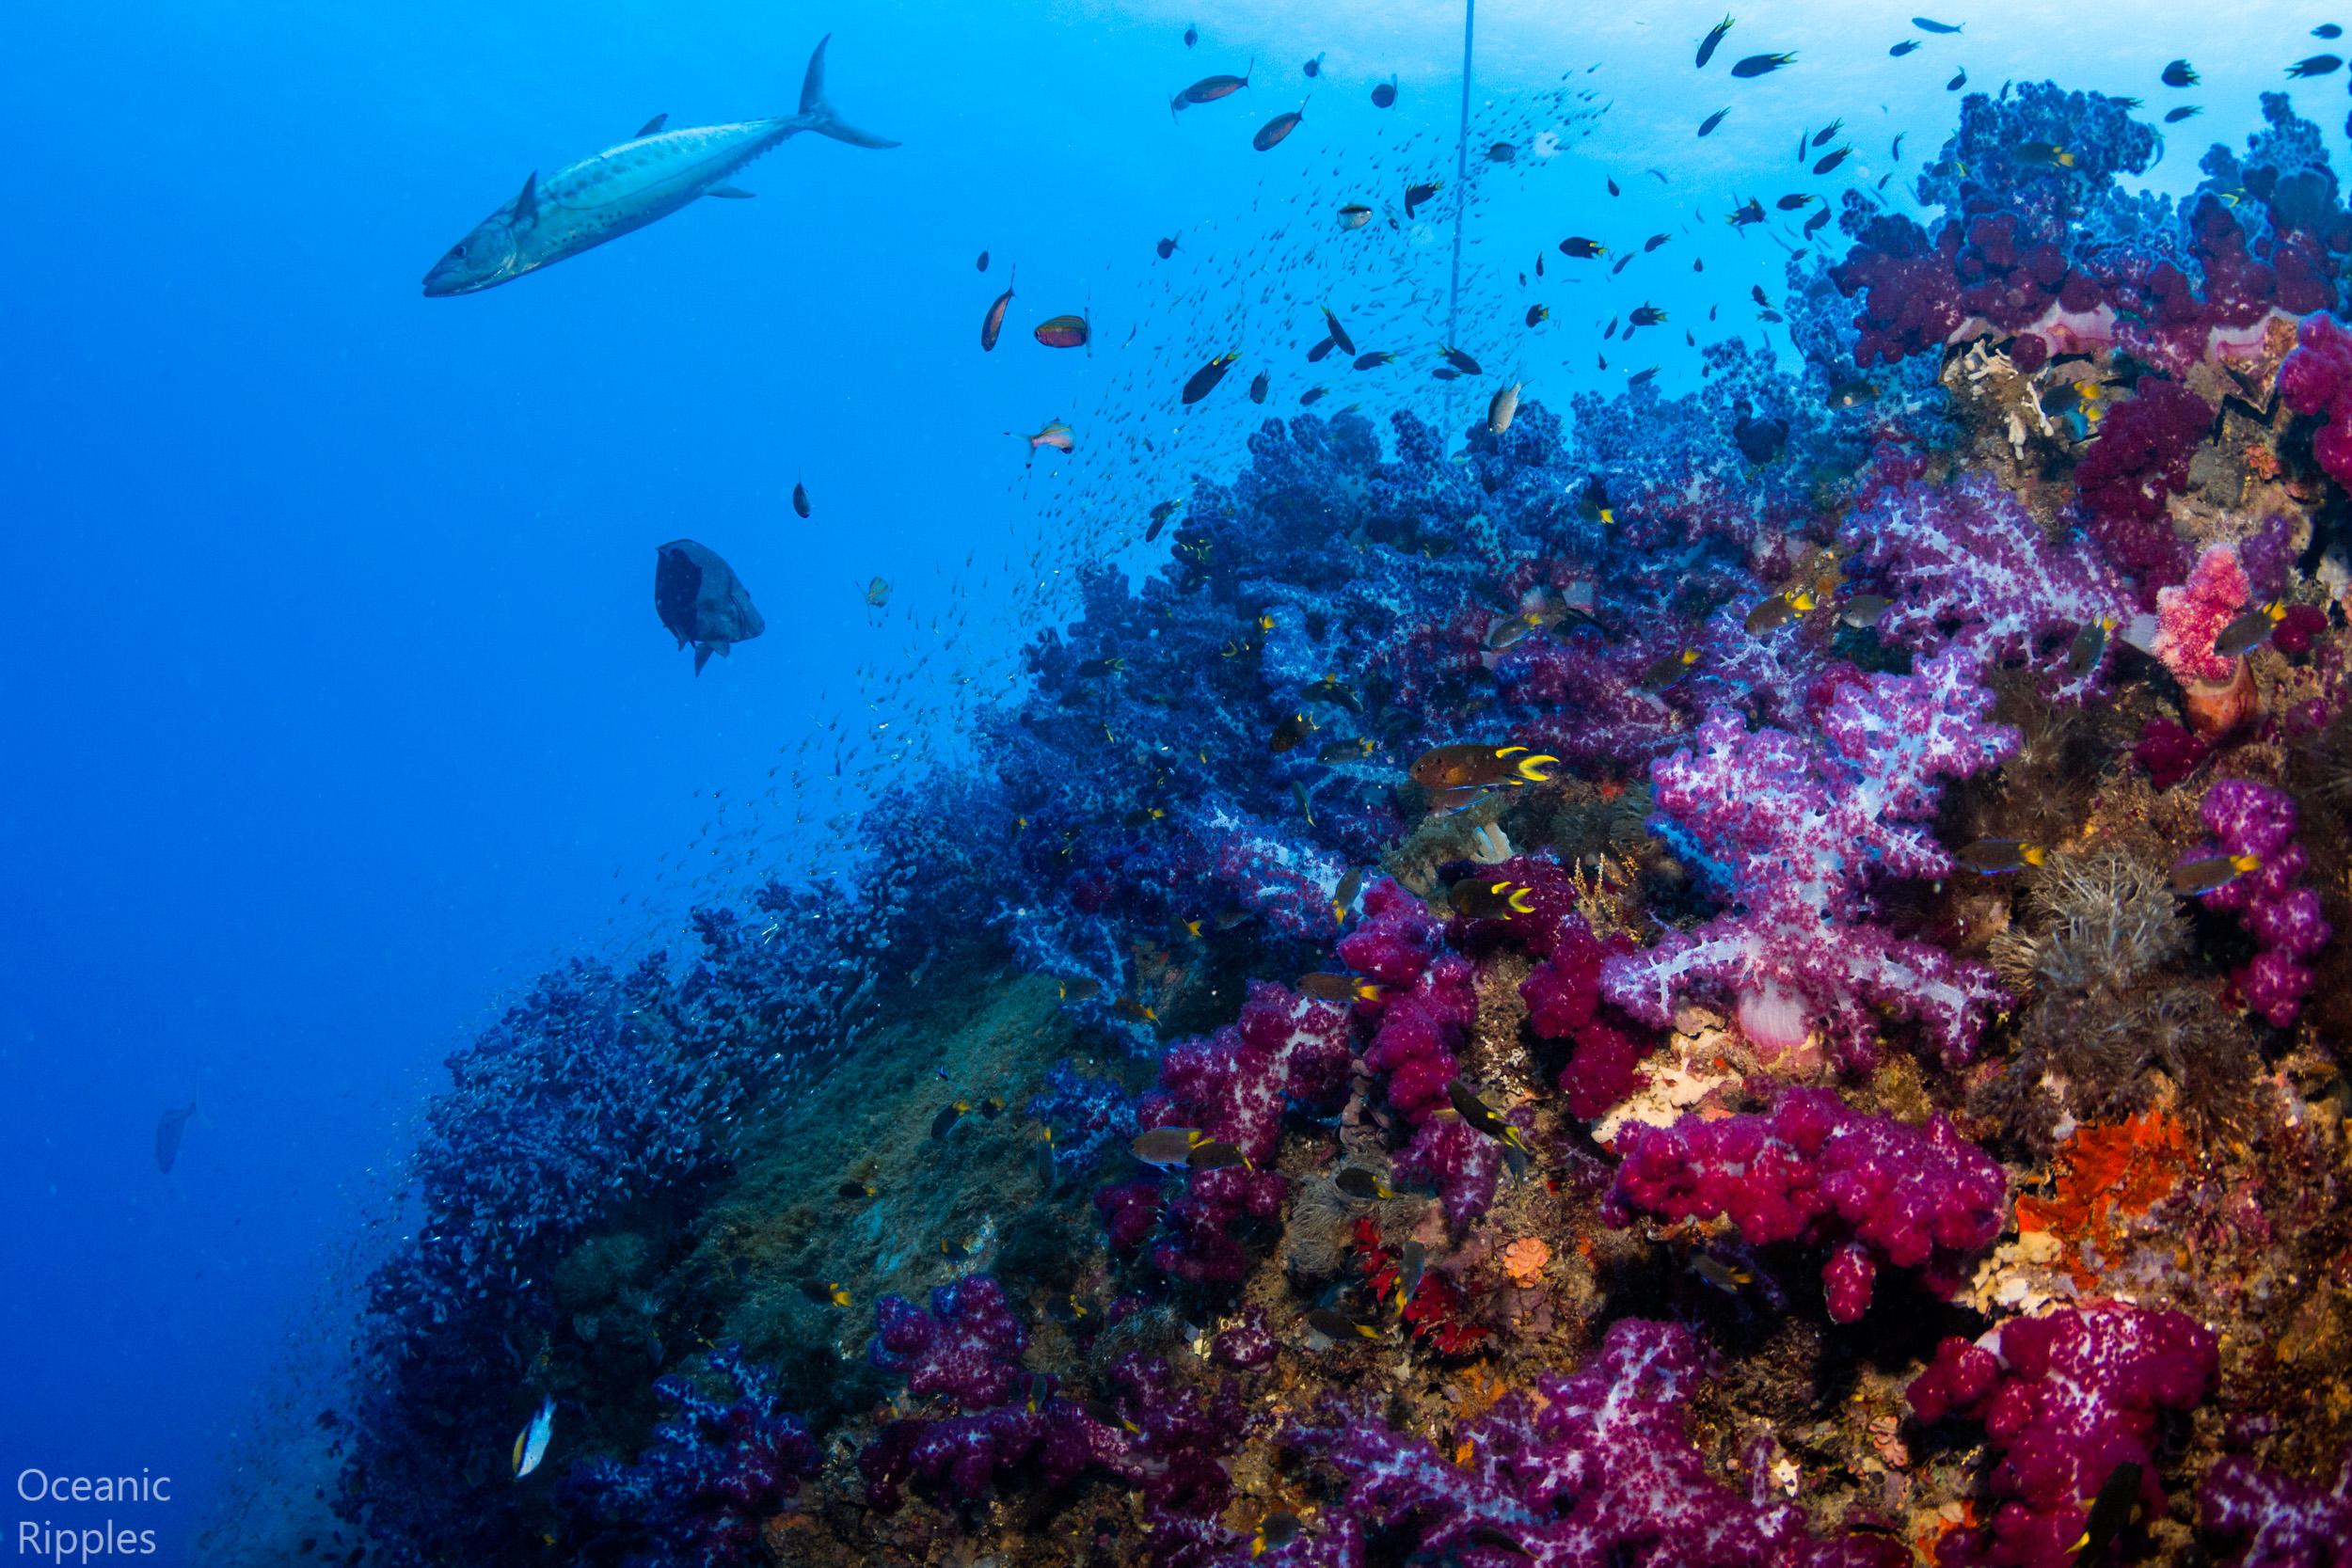 Oceanic Ripples — SS Yongala Wreck, Australia